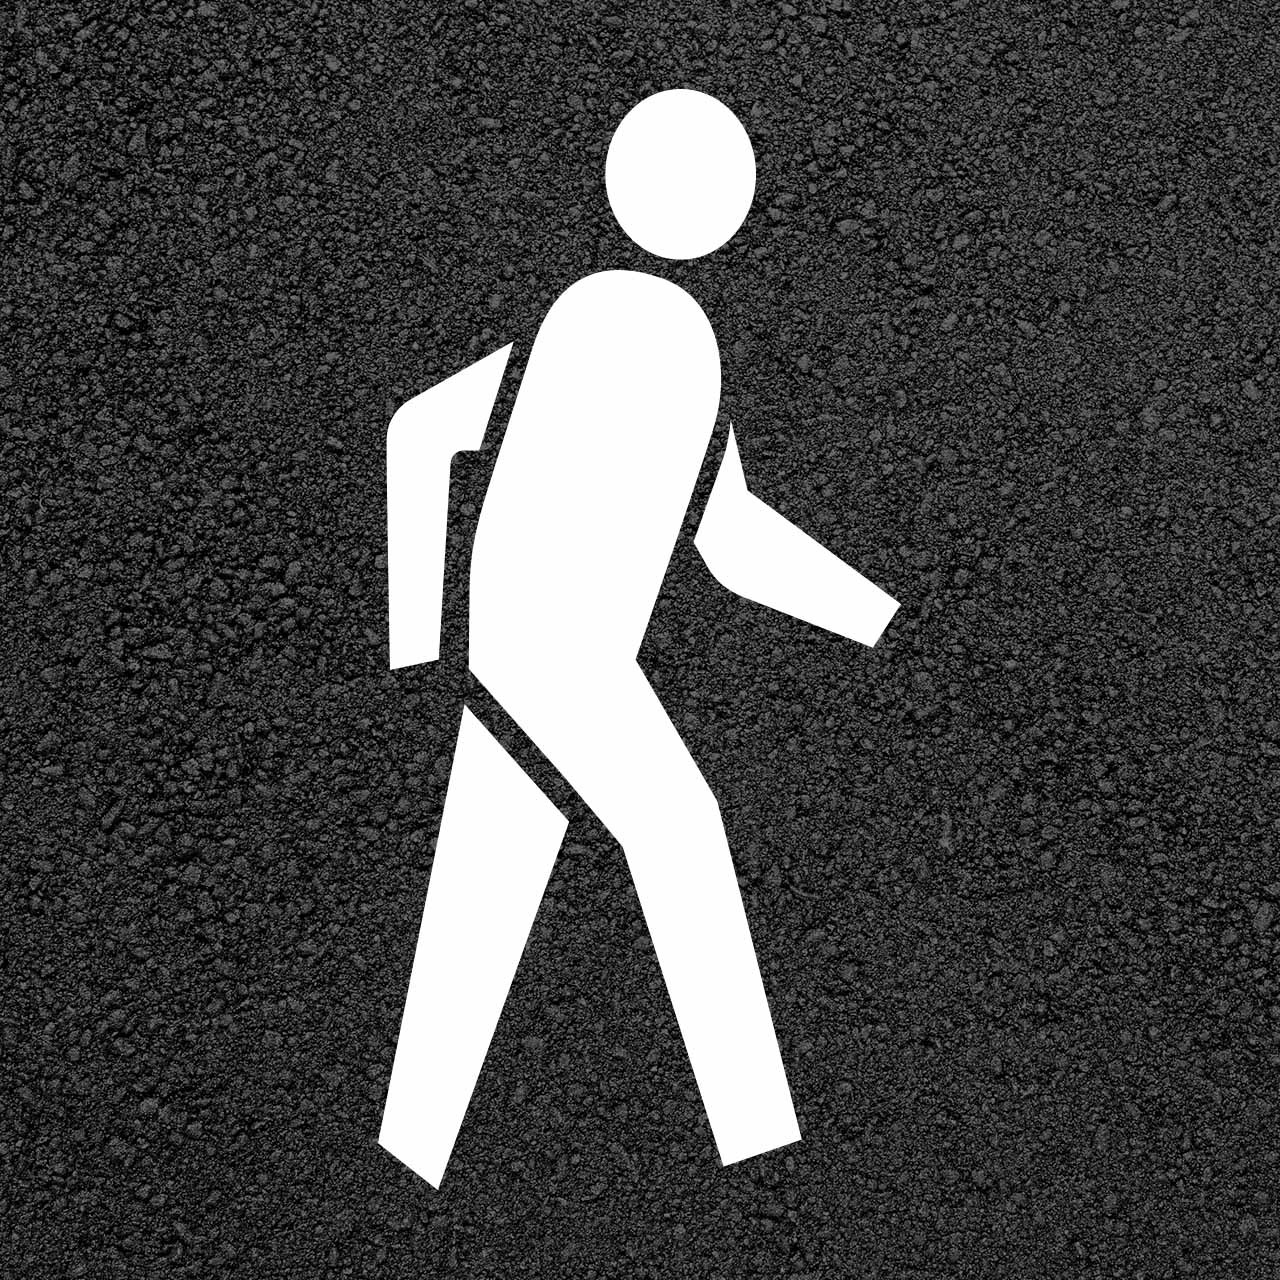 Pedestrian Crossing Symbol Stencil   Stop-Painting